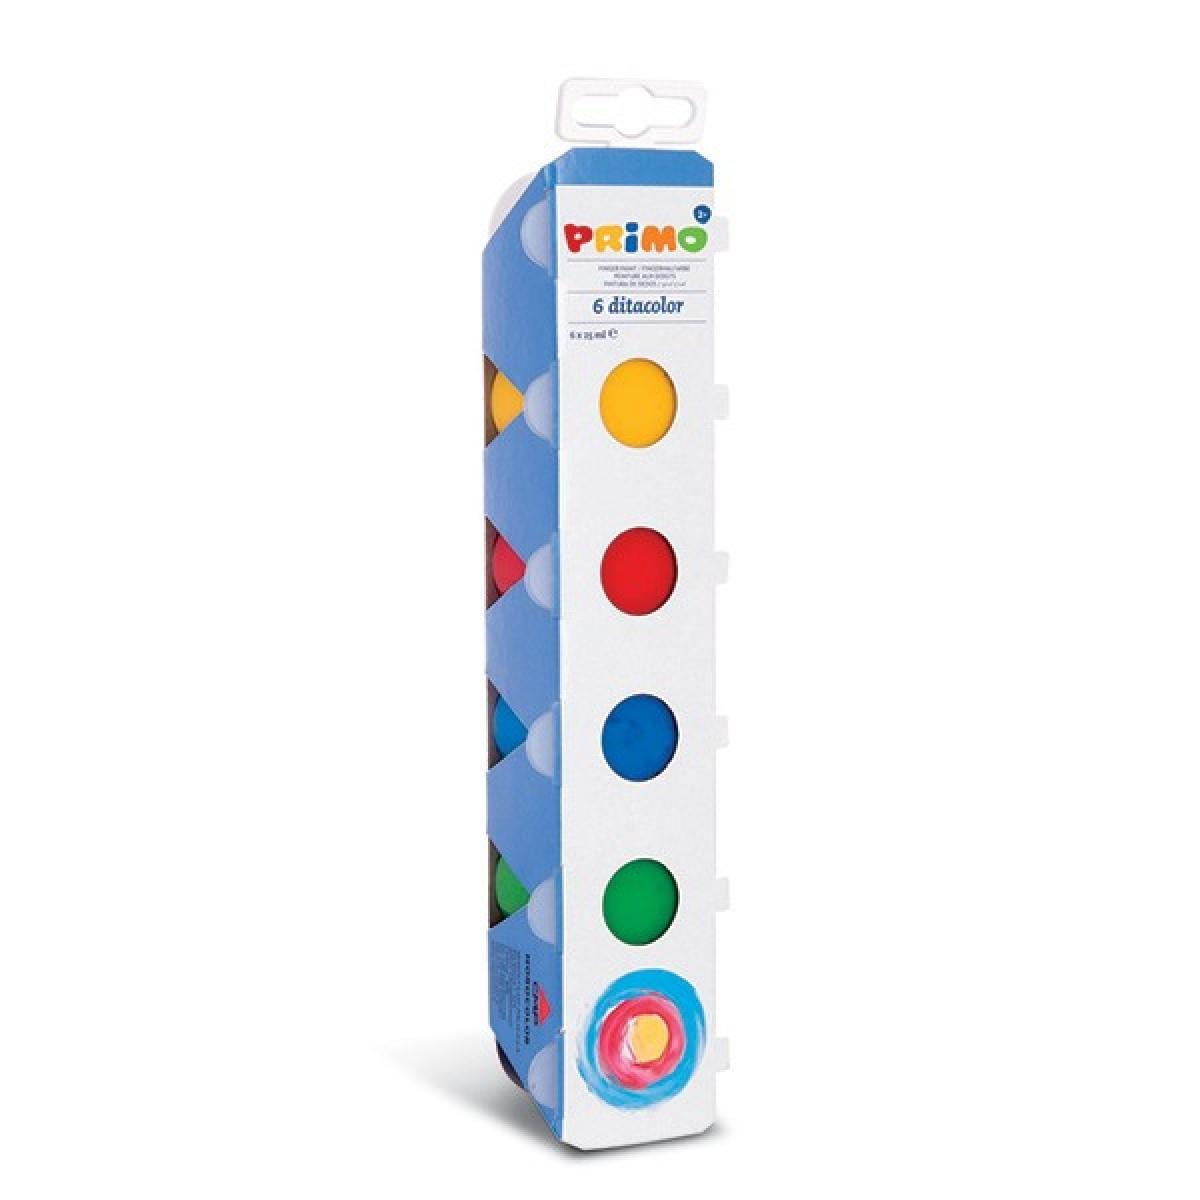 Primo Δακτυλομπογιές (6 Χρώματα) 25ml